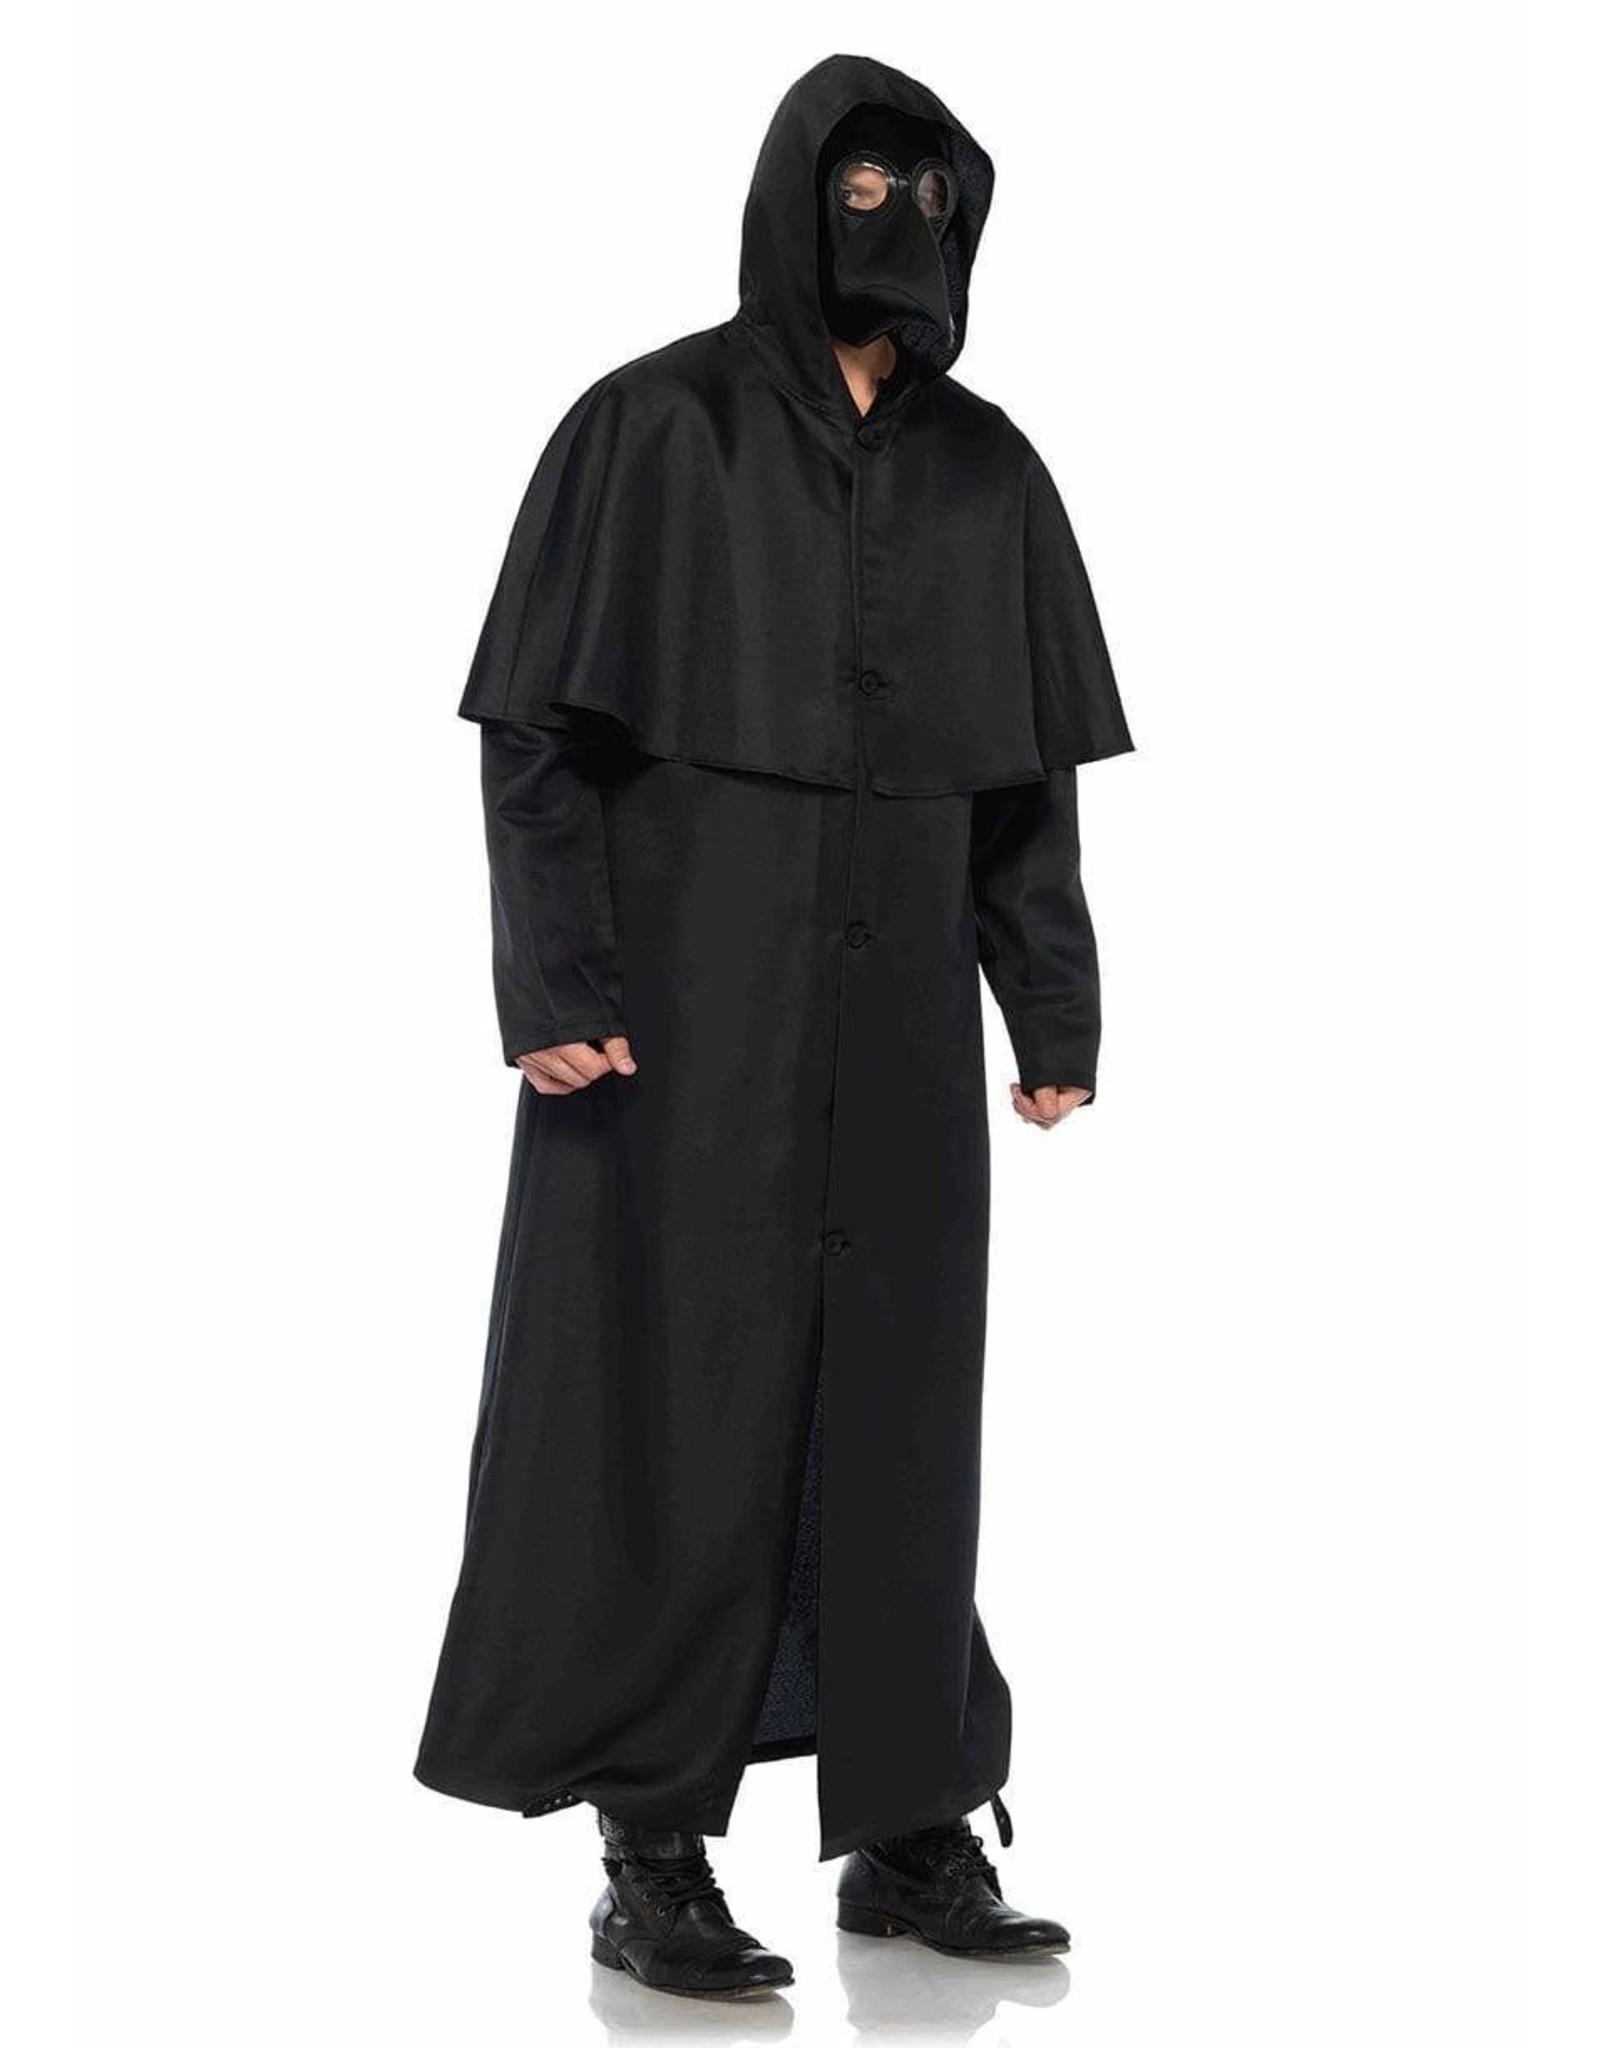 Leg Avenue Hooded Cloak